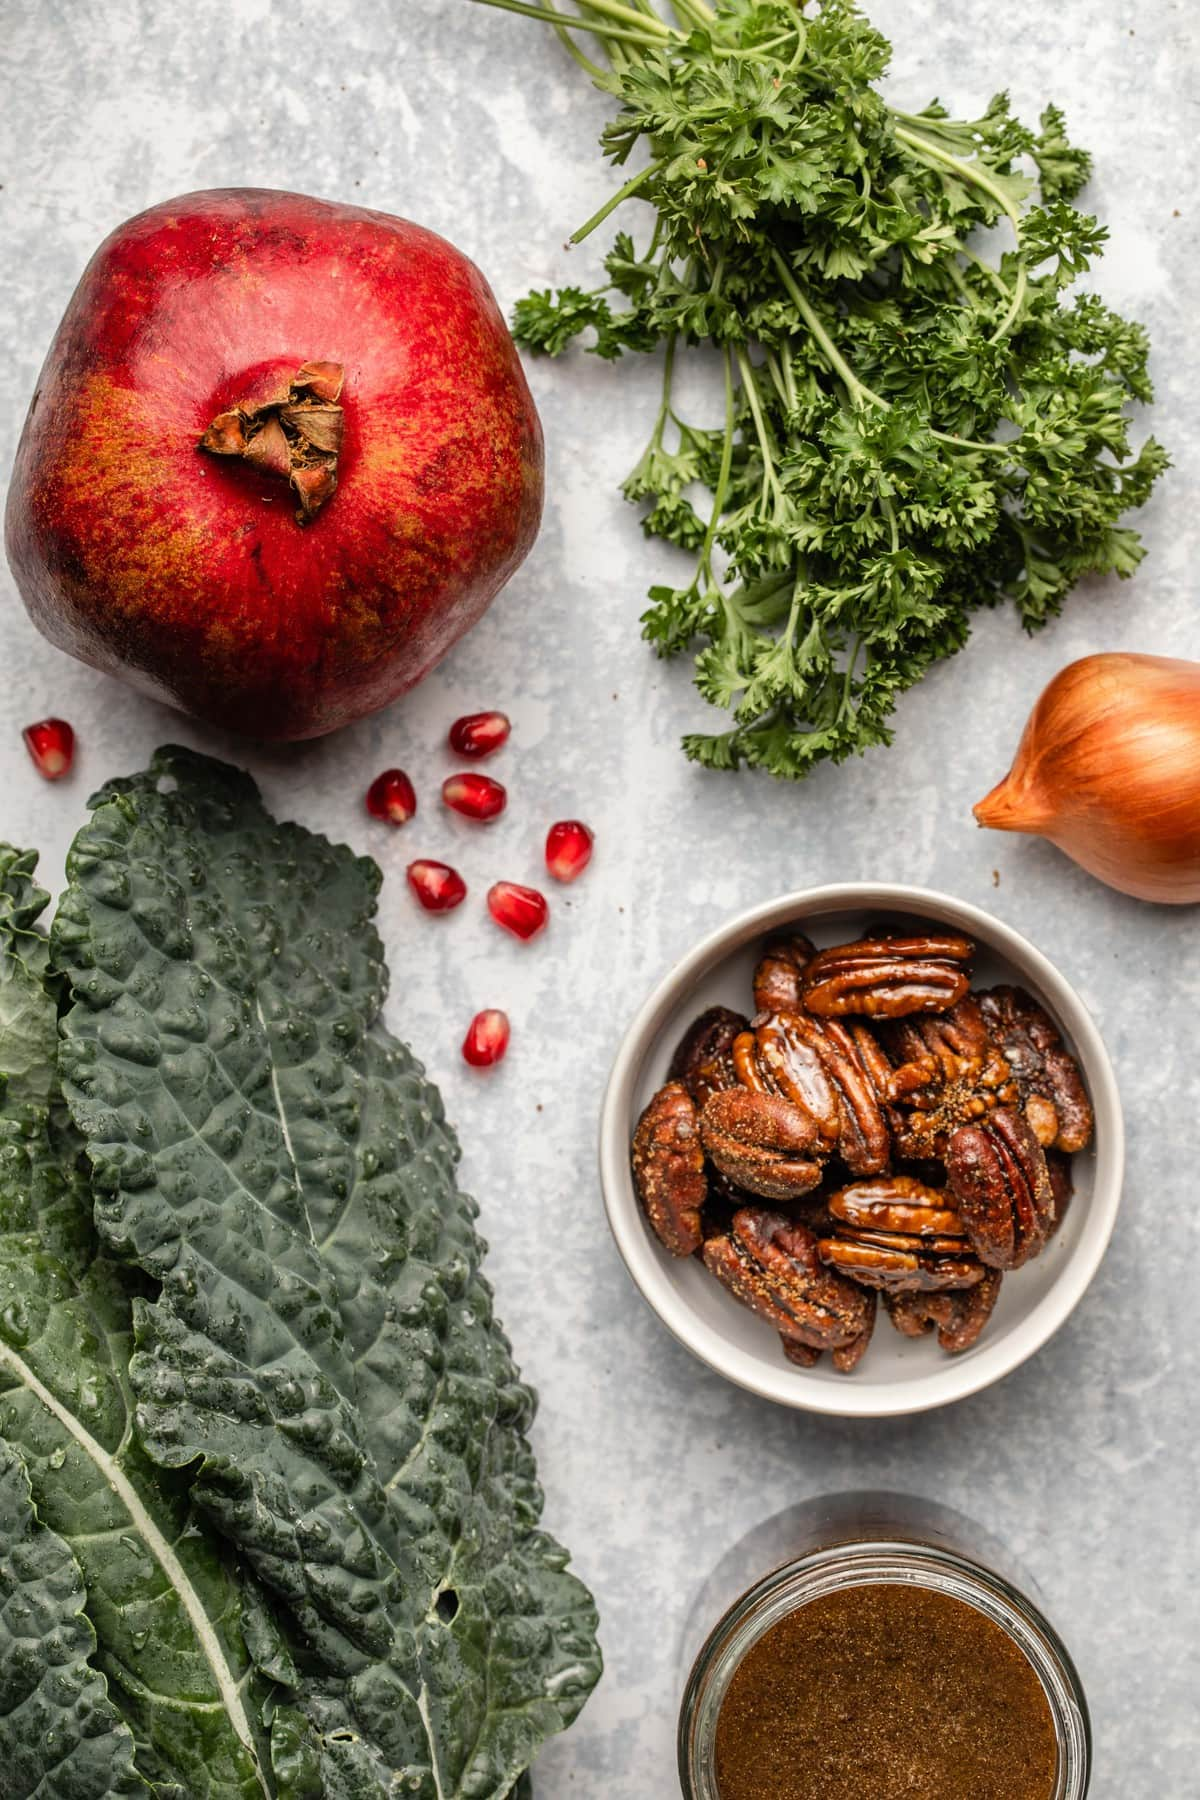 ingredients for kale salad on blue textured background